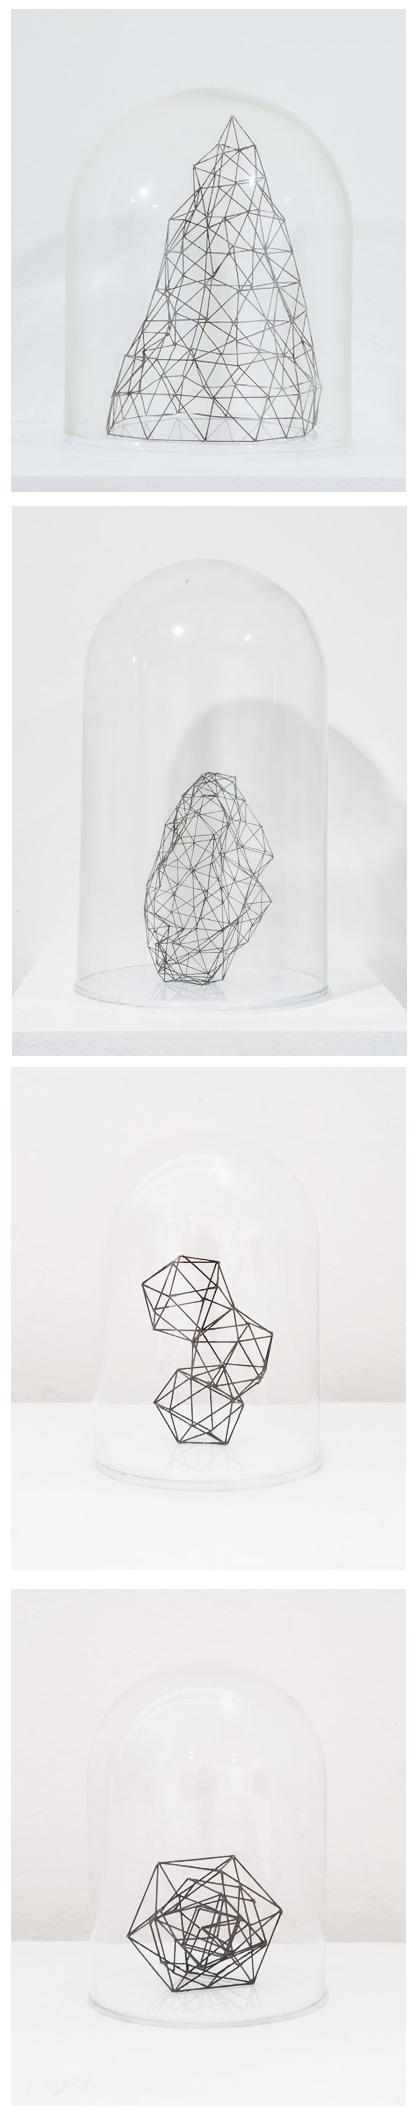 Peter Trevelyan || Mysterium cosmographica || 2014 || 0.5mm graphite, bell jar